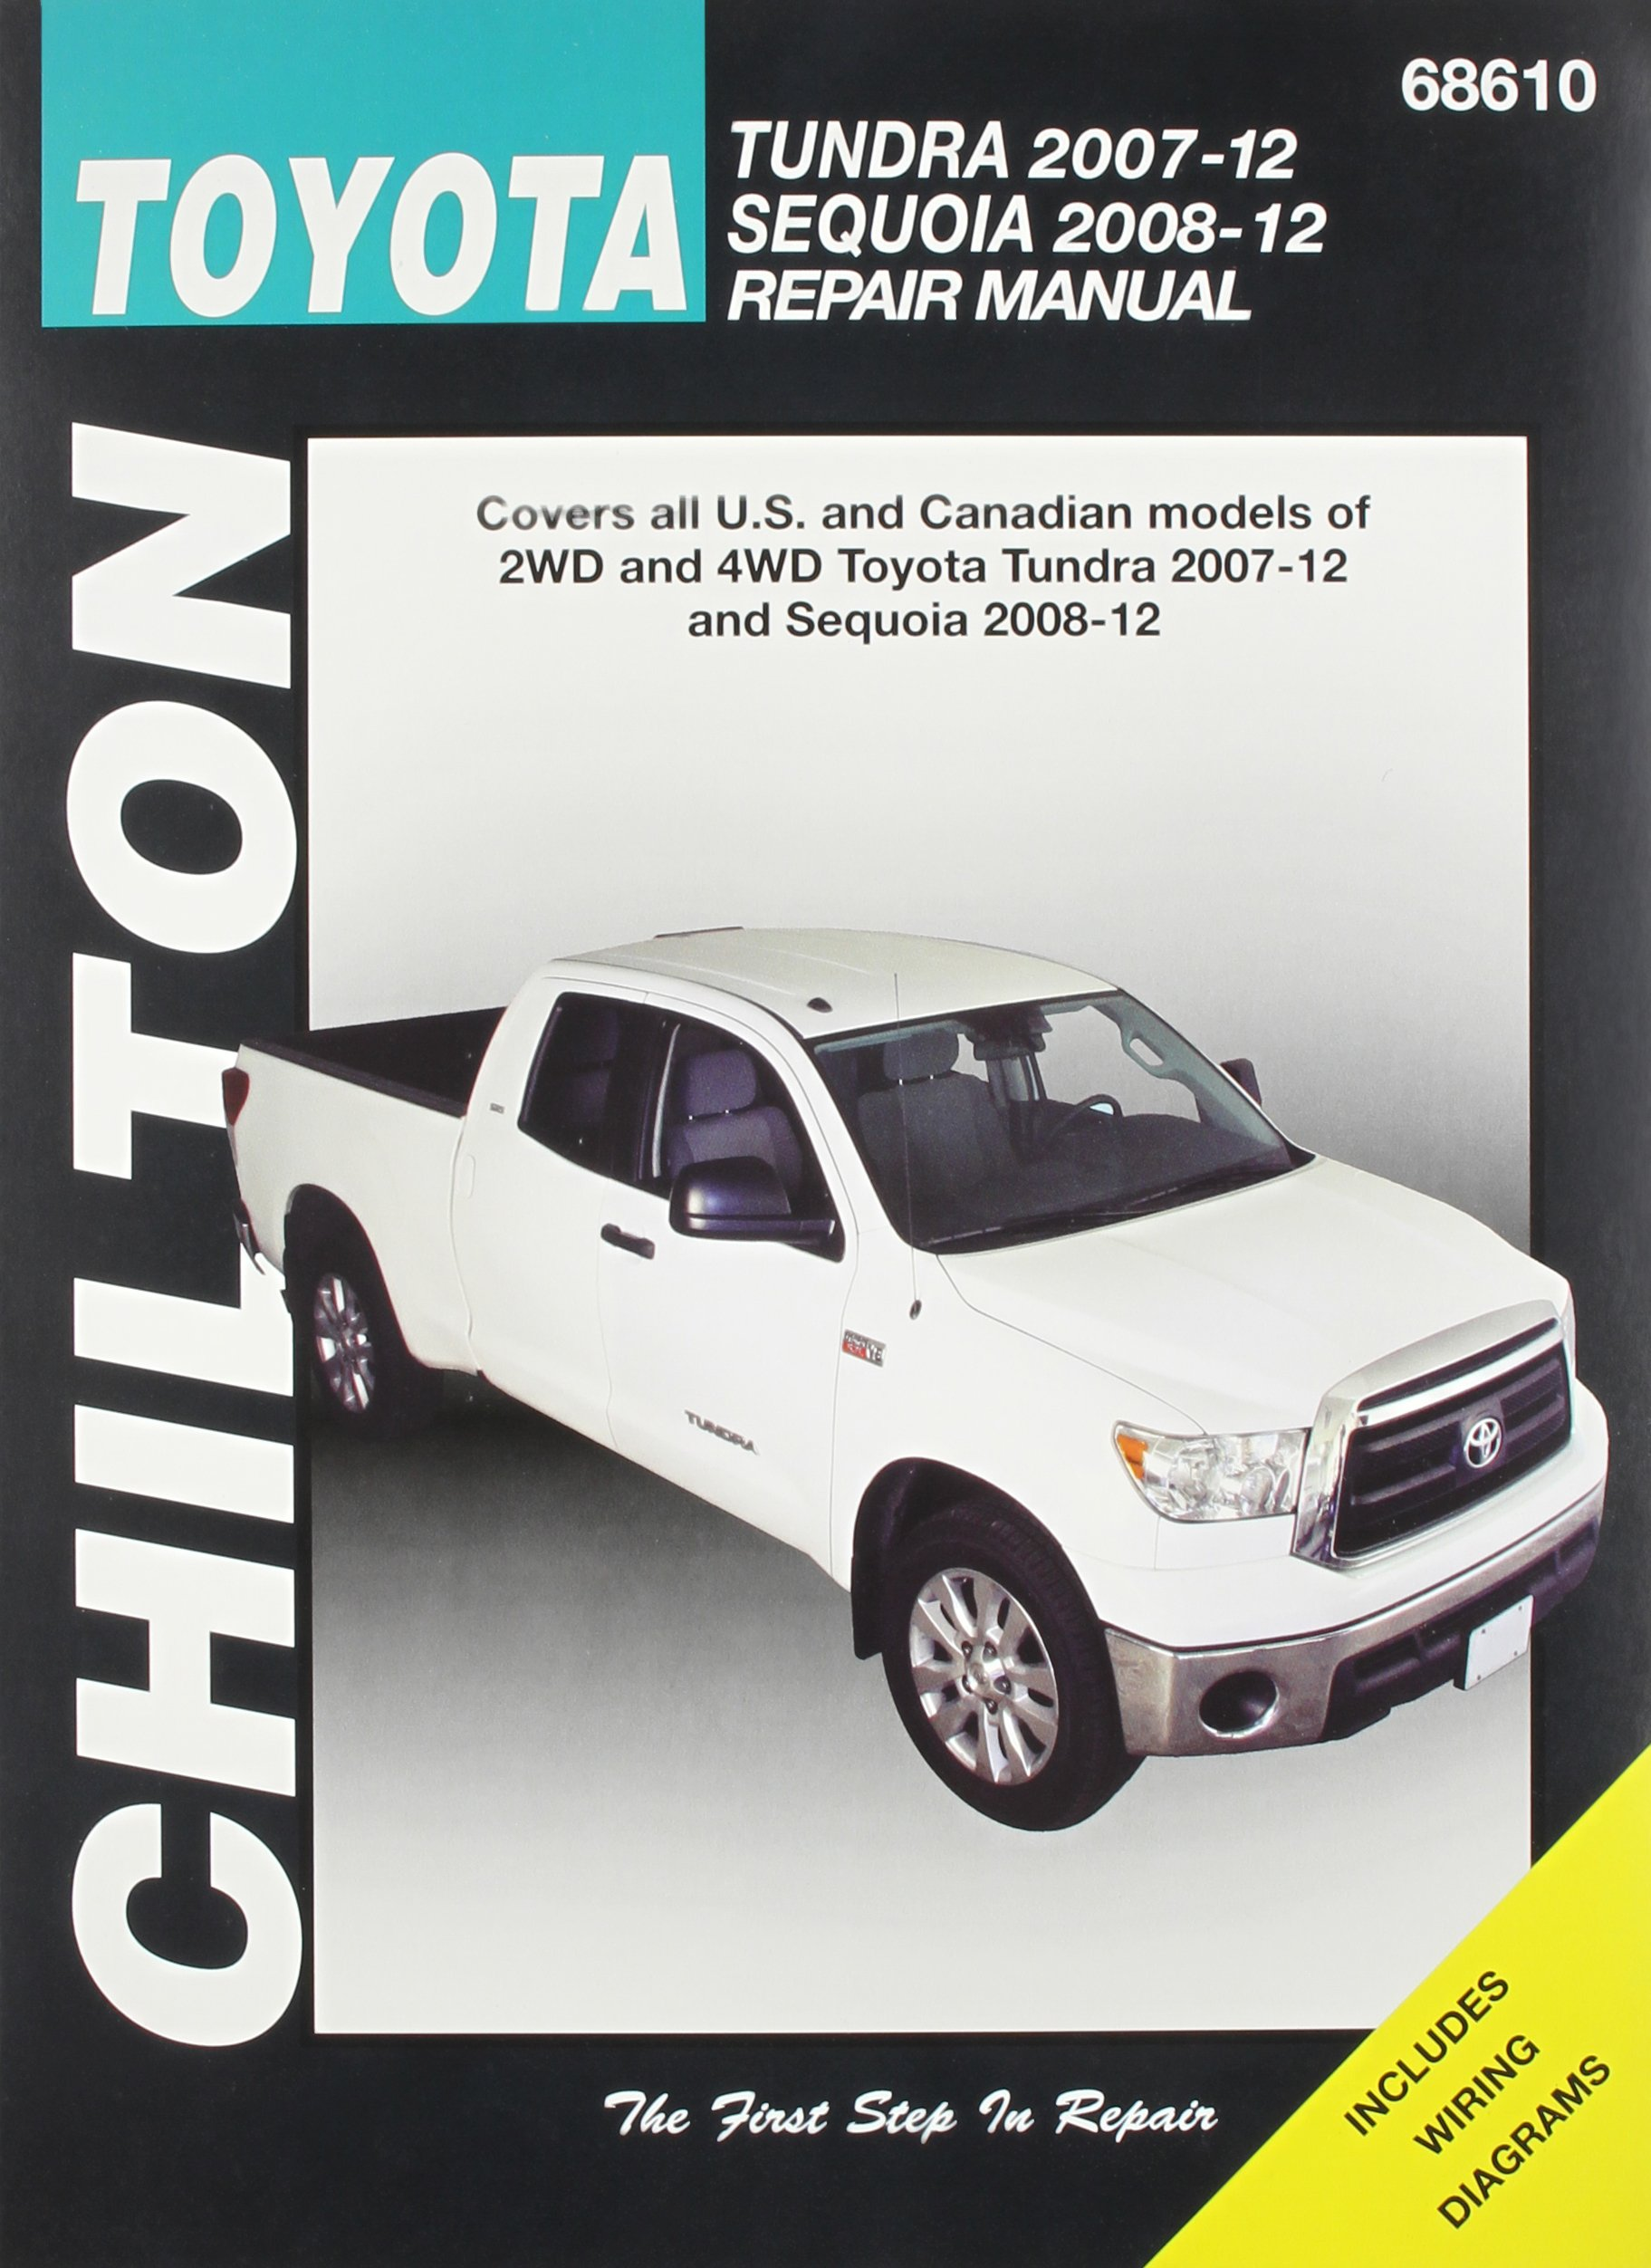 Chilton Total Car Care Toyota Tundra 2007-2012 & Sequoia 2008-2012 Repair  Manual